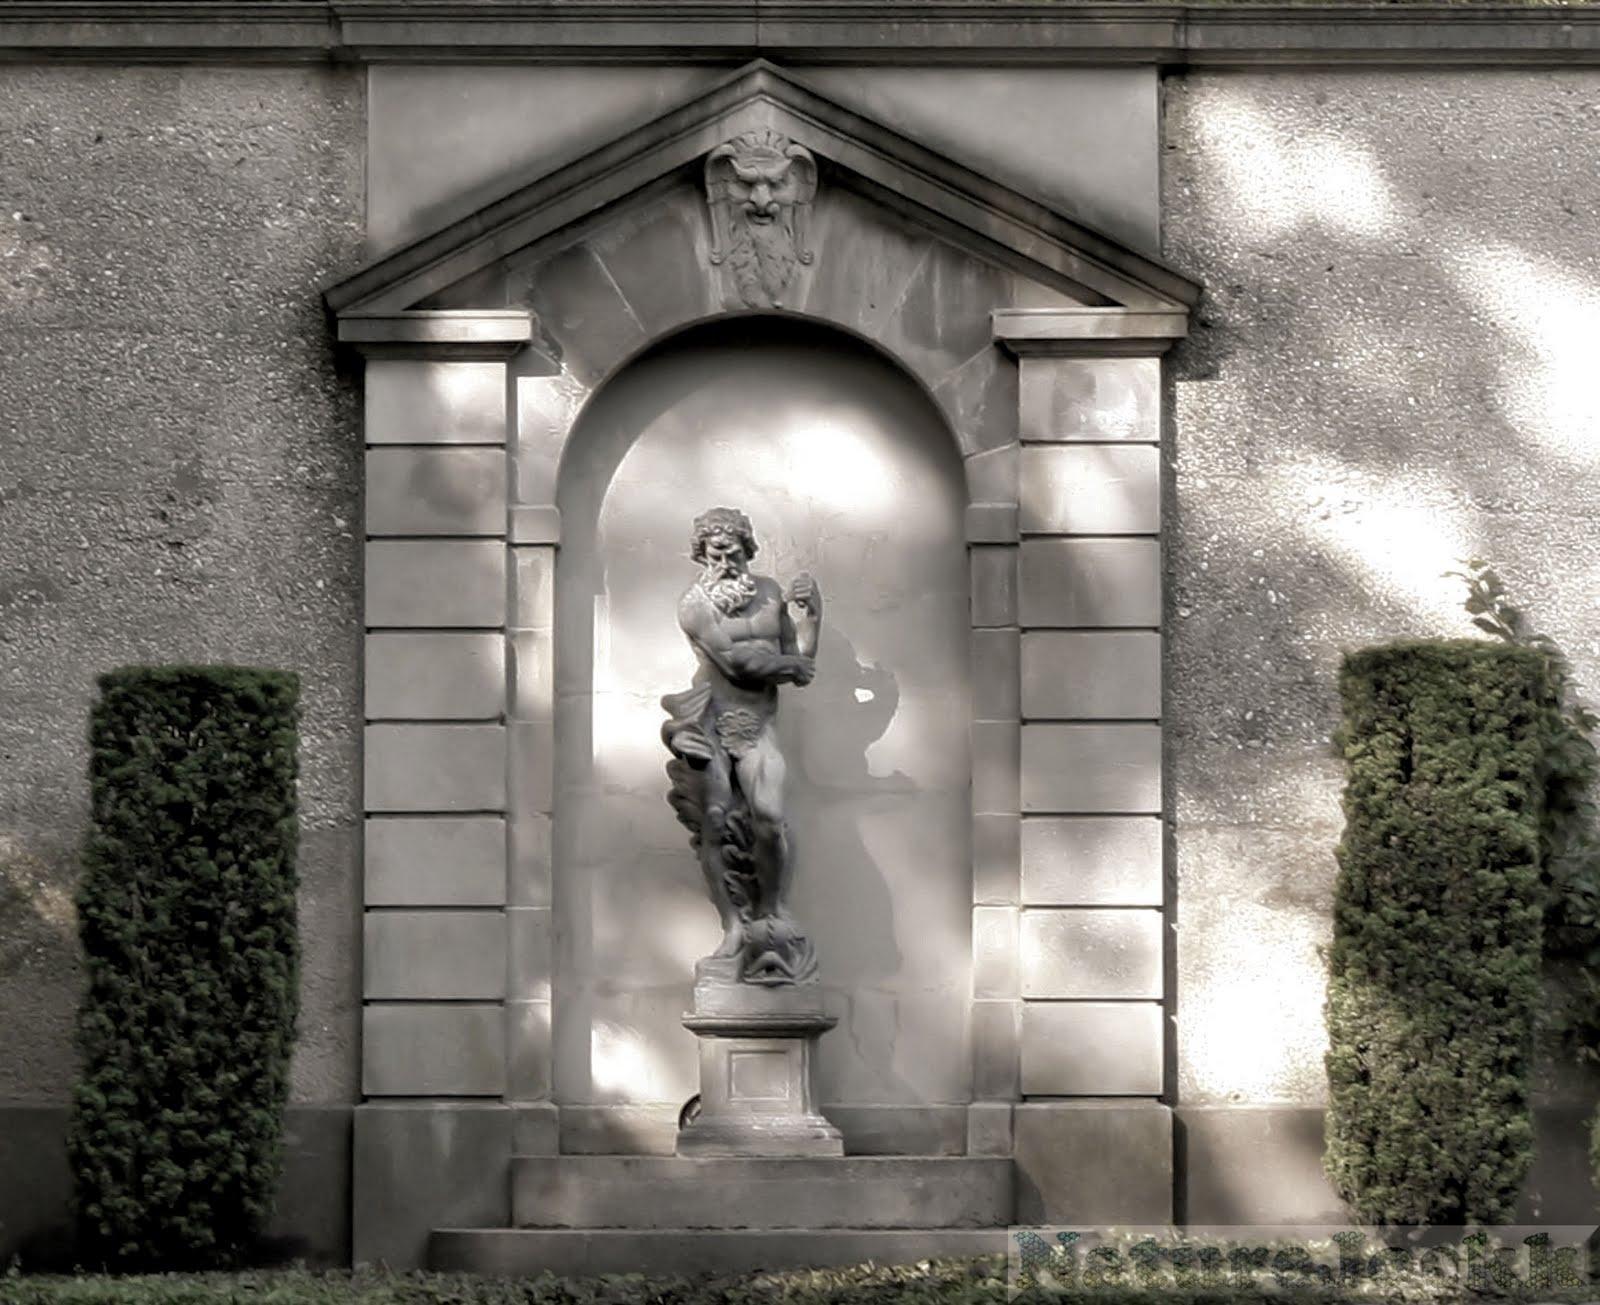 http://3.bp.blogspot.com/_6ANko4sjweM/SxPr6SicVmI/AAAAAAAAXKw/iVNLOhBtOXU/s1600/Statues_2_retouched.jpg